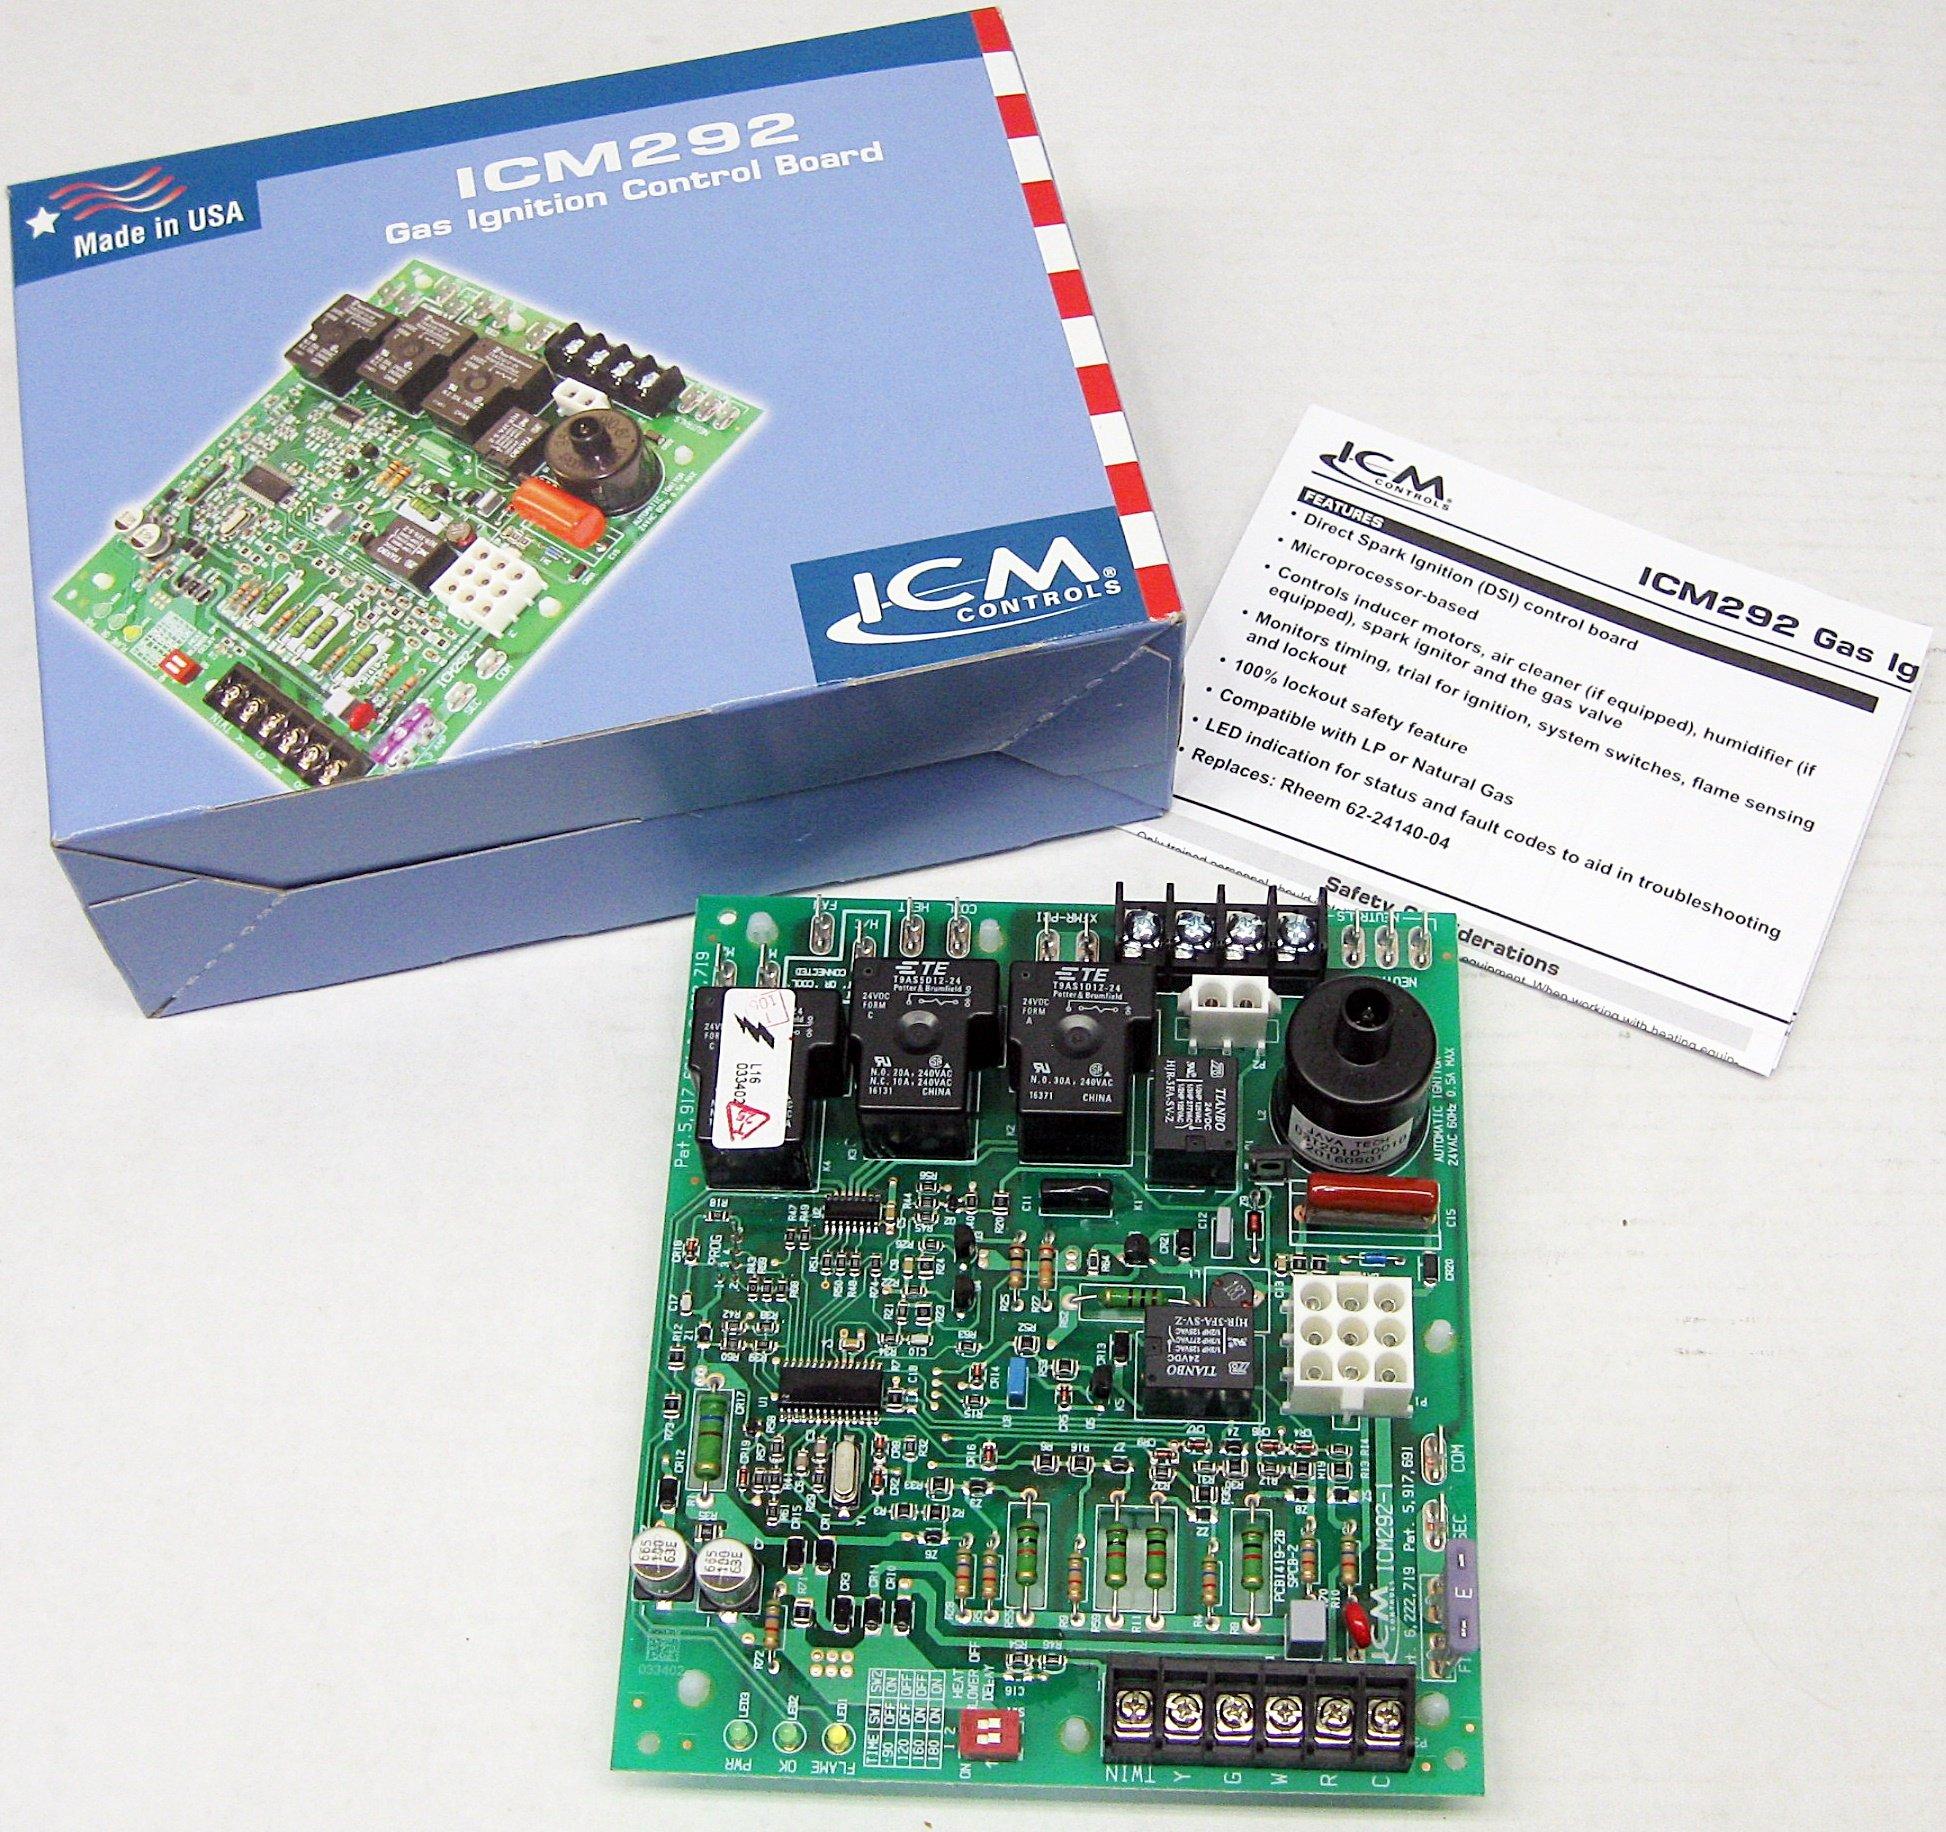 ICM Product 292 by ICM (Image #1)